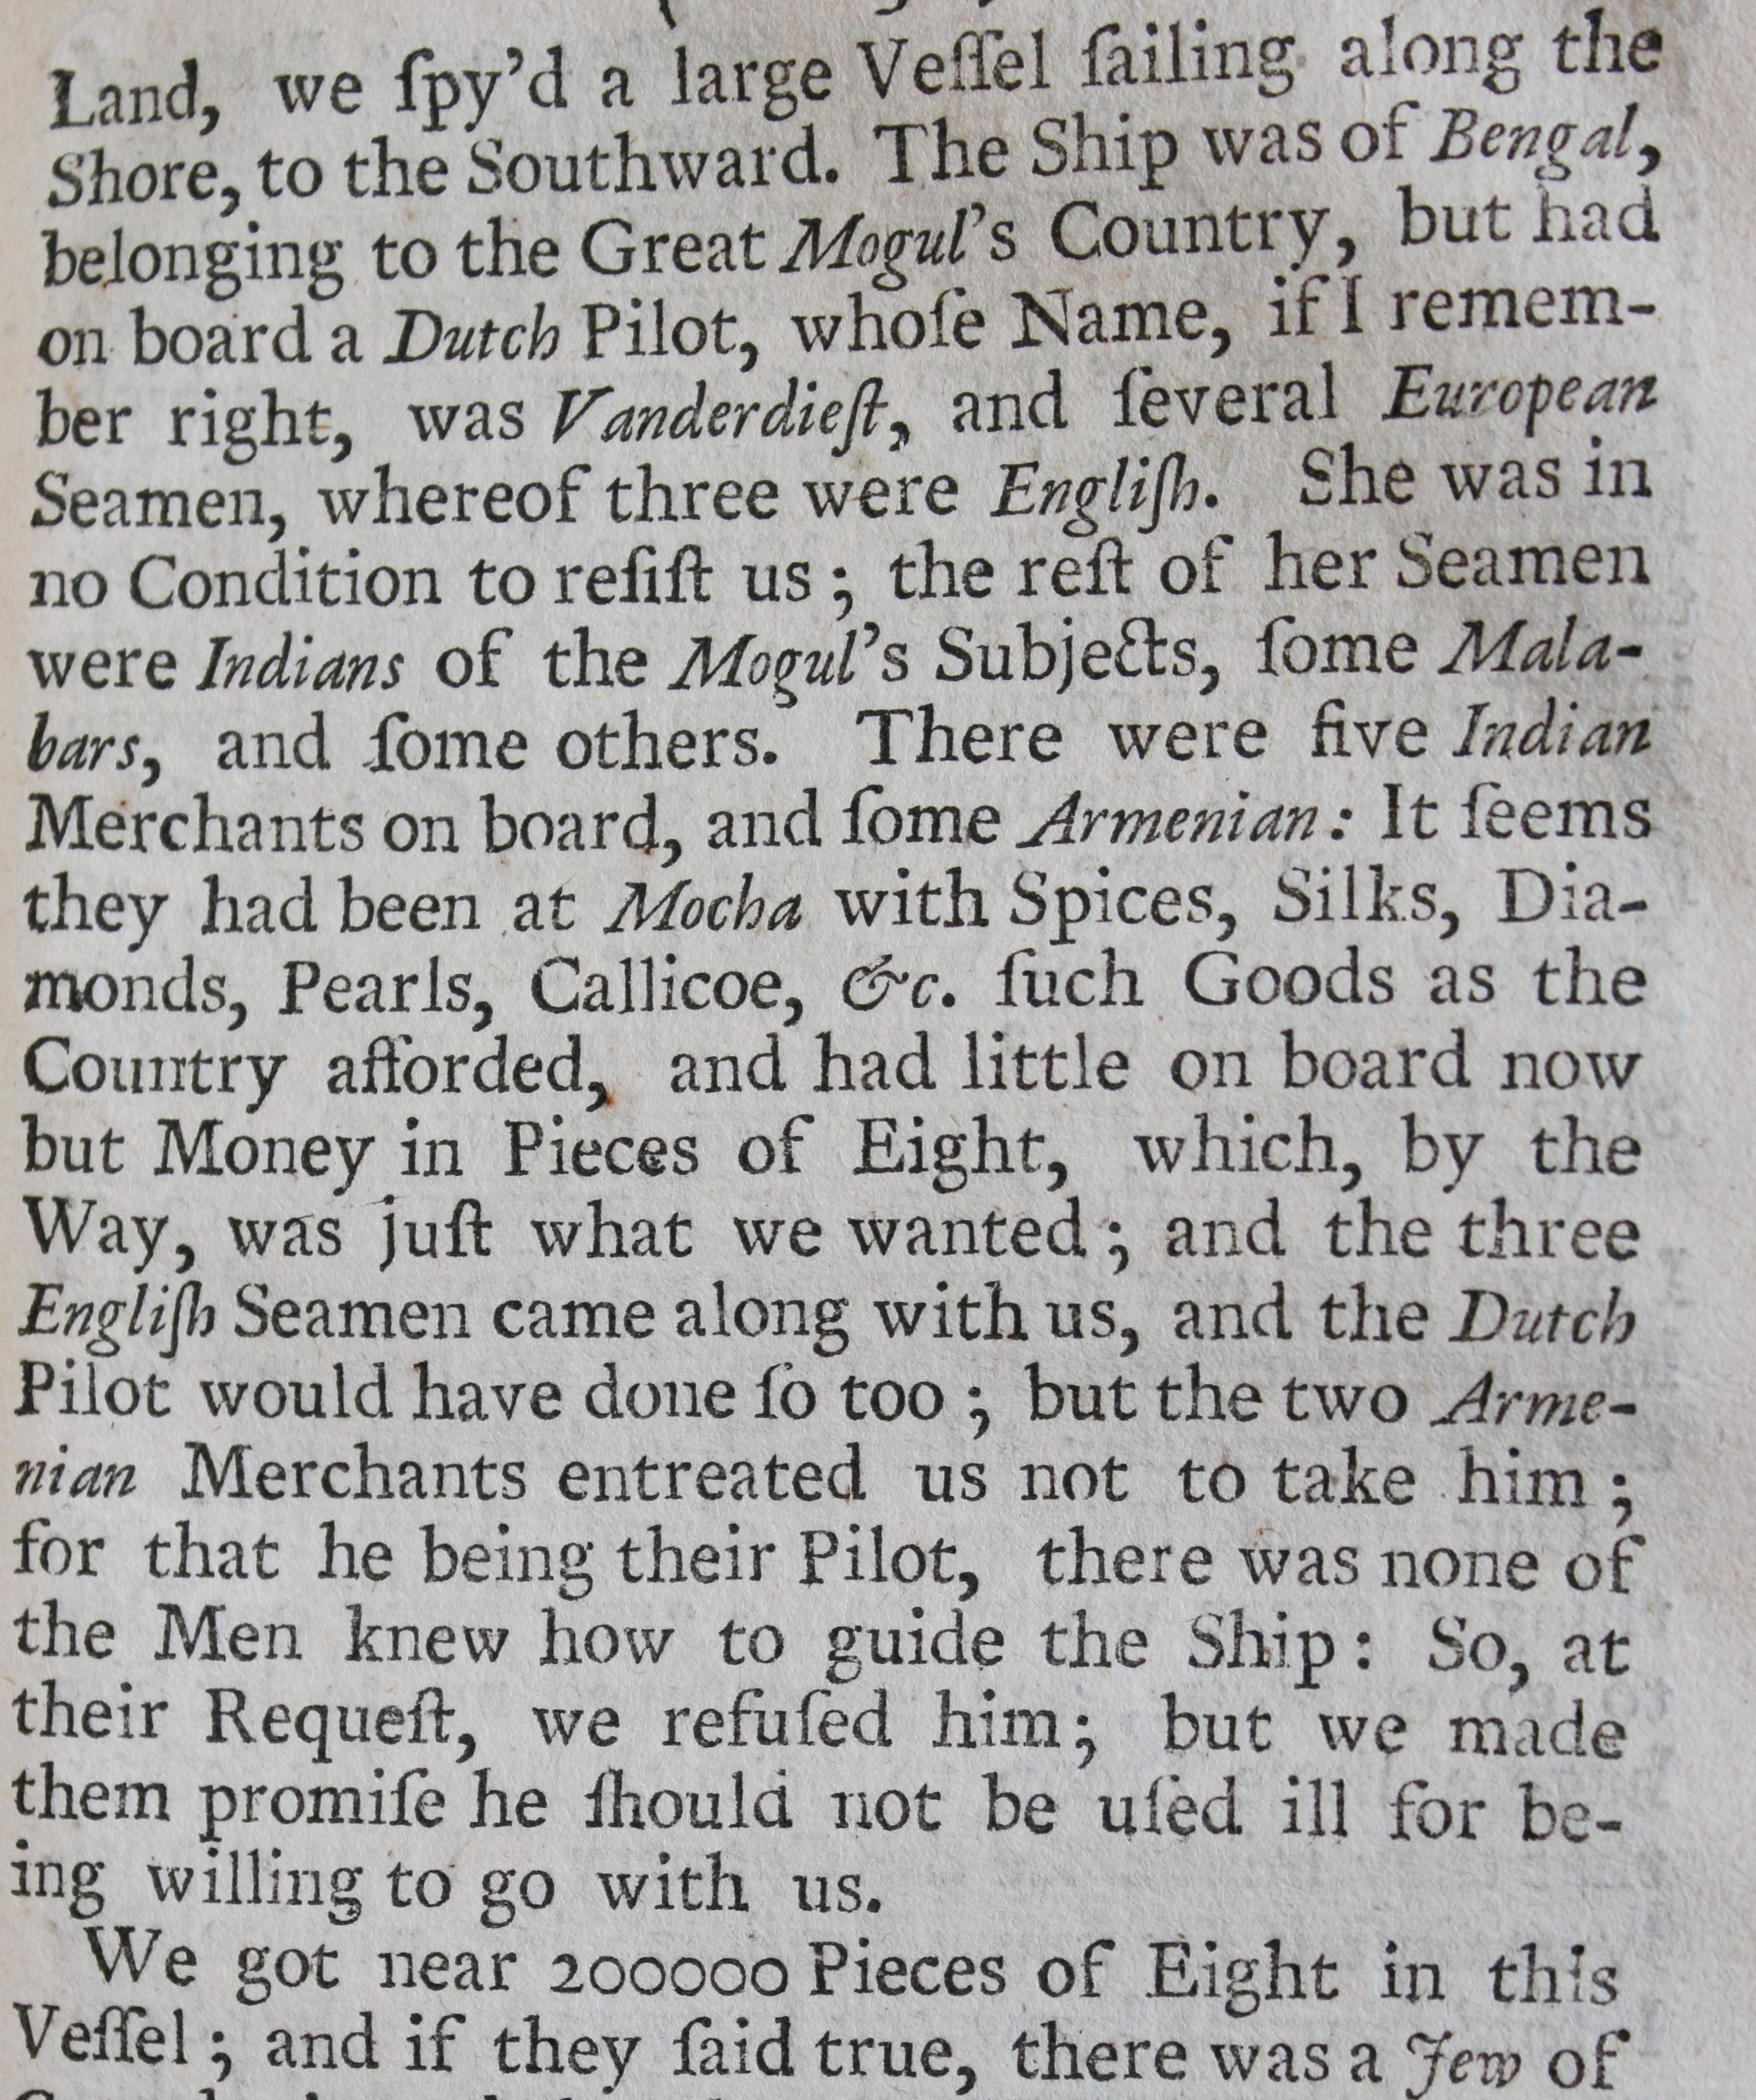 Thackeray.VIII.11.11 page 213 extract